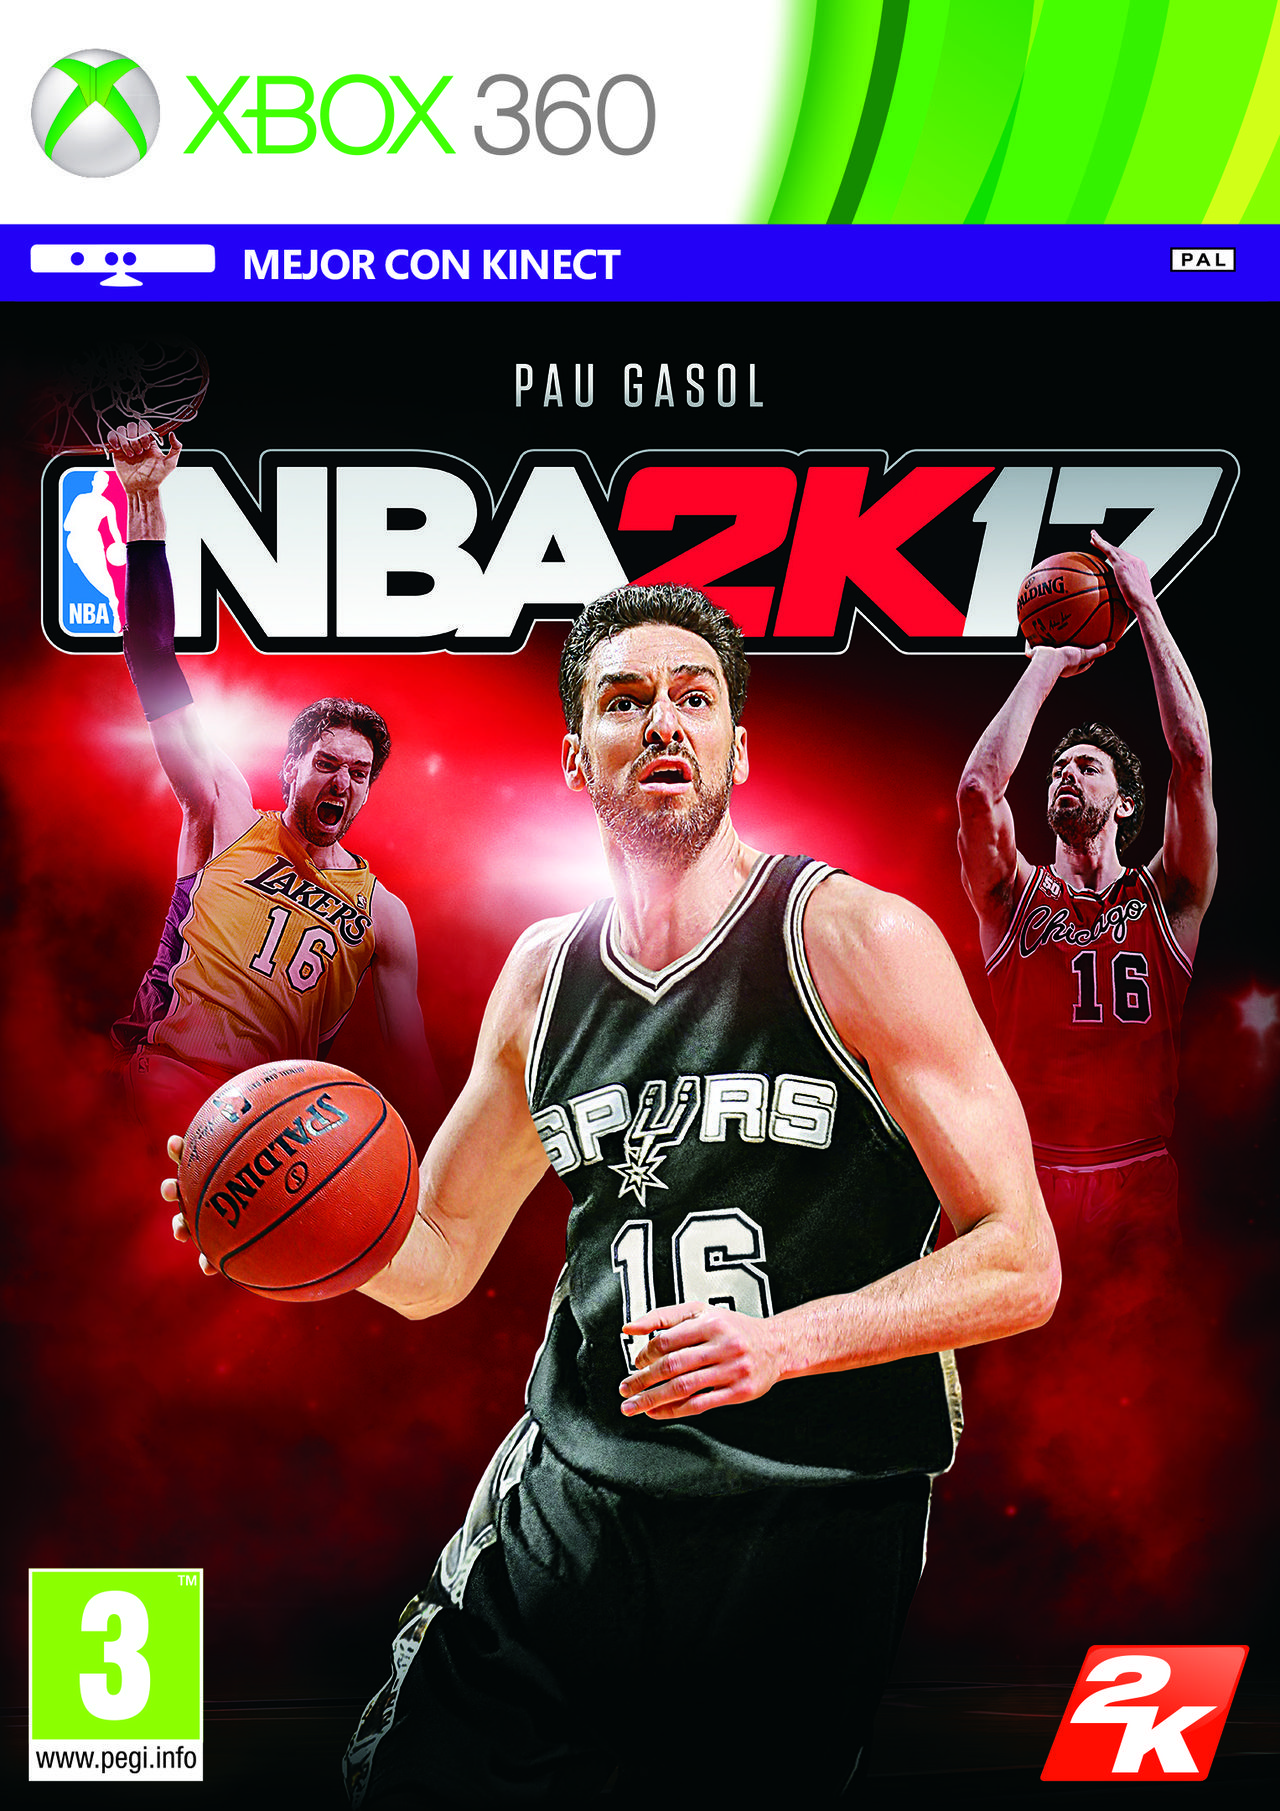 NBA 2K17 Xbox 360 Download Full Version Game - Full Free ...